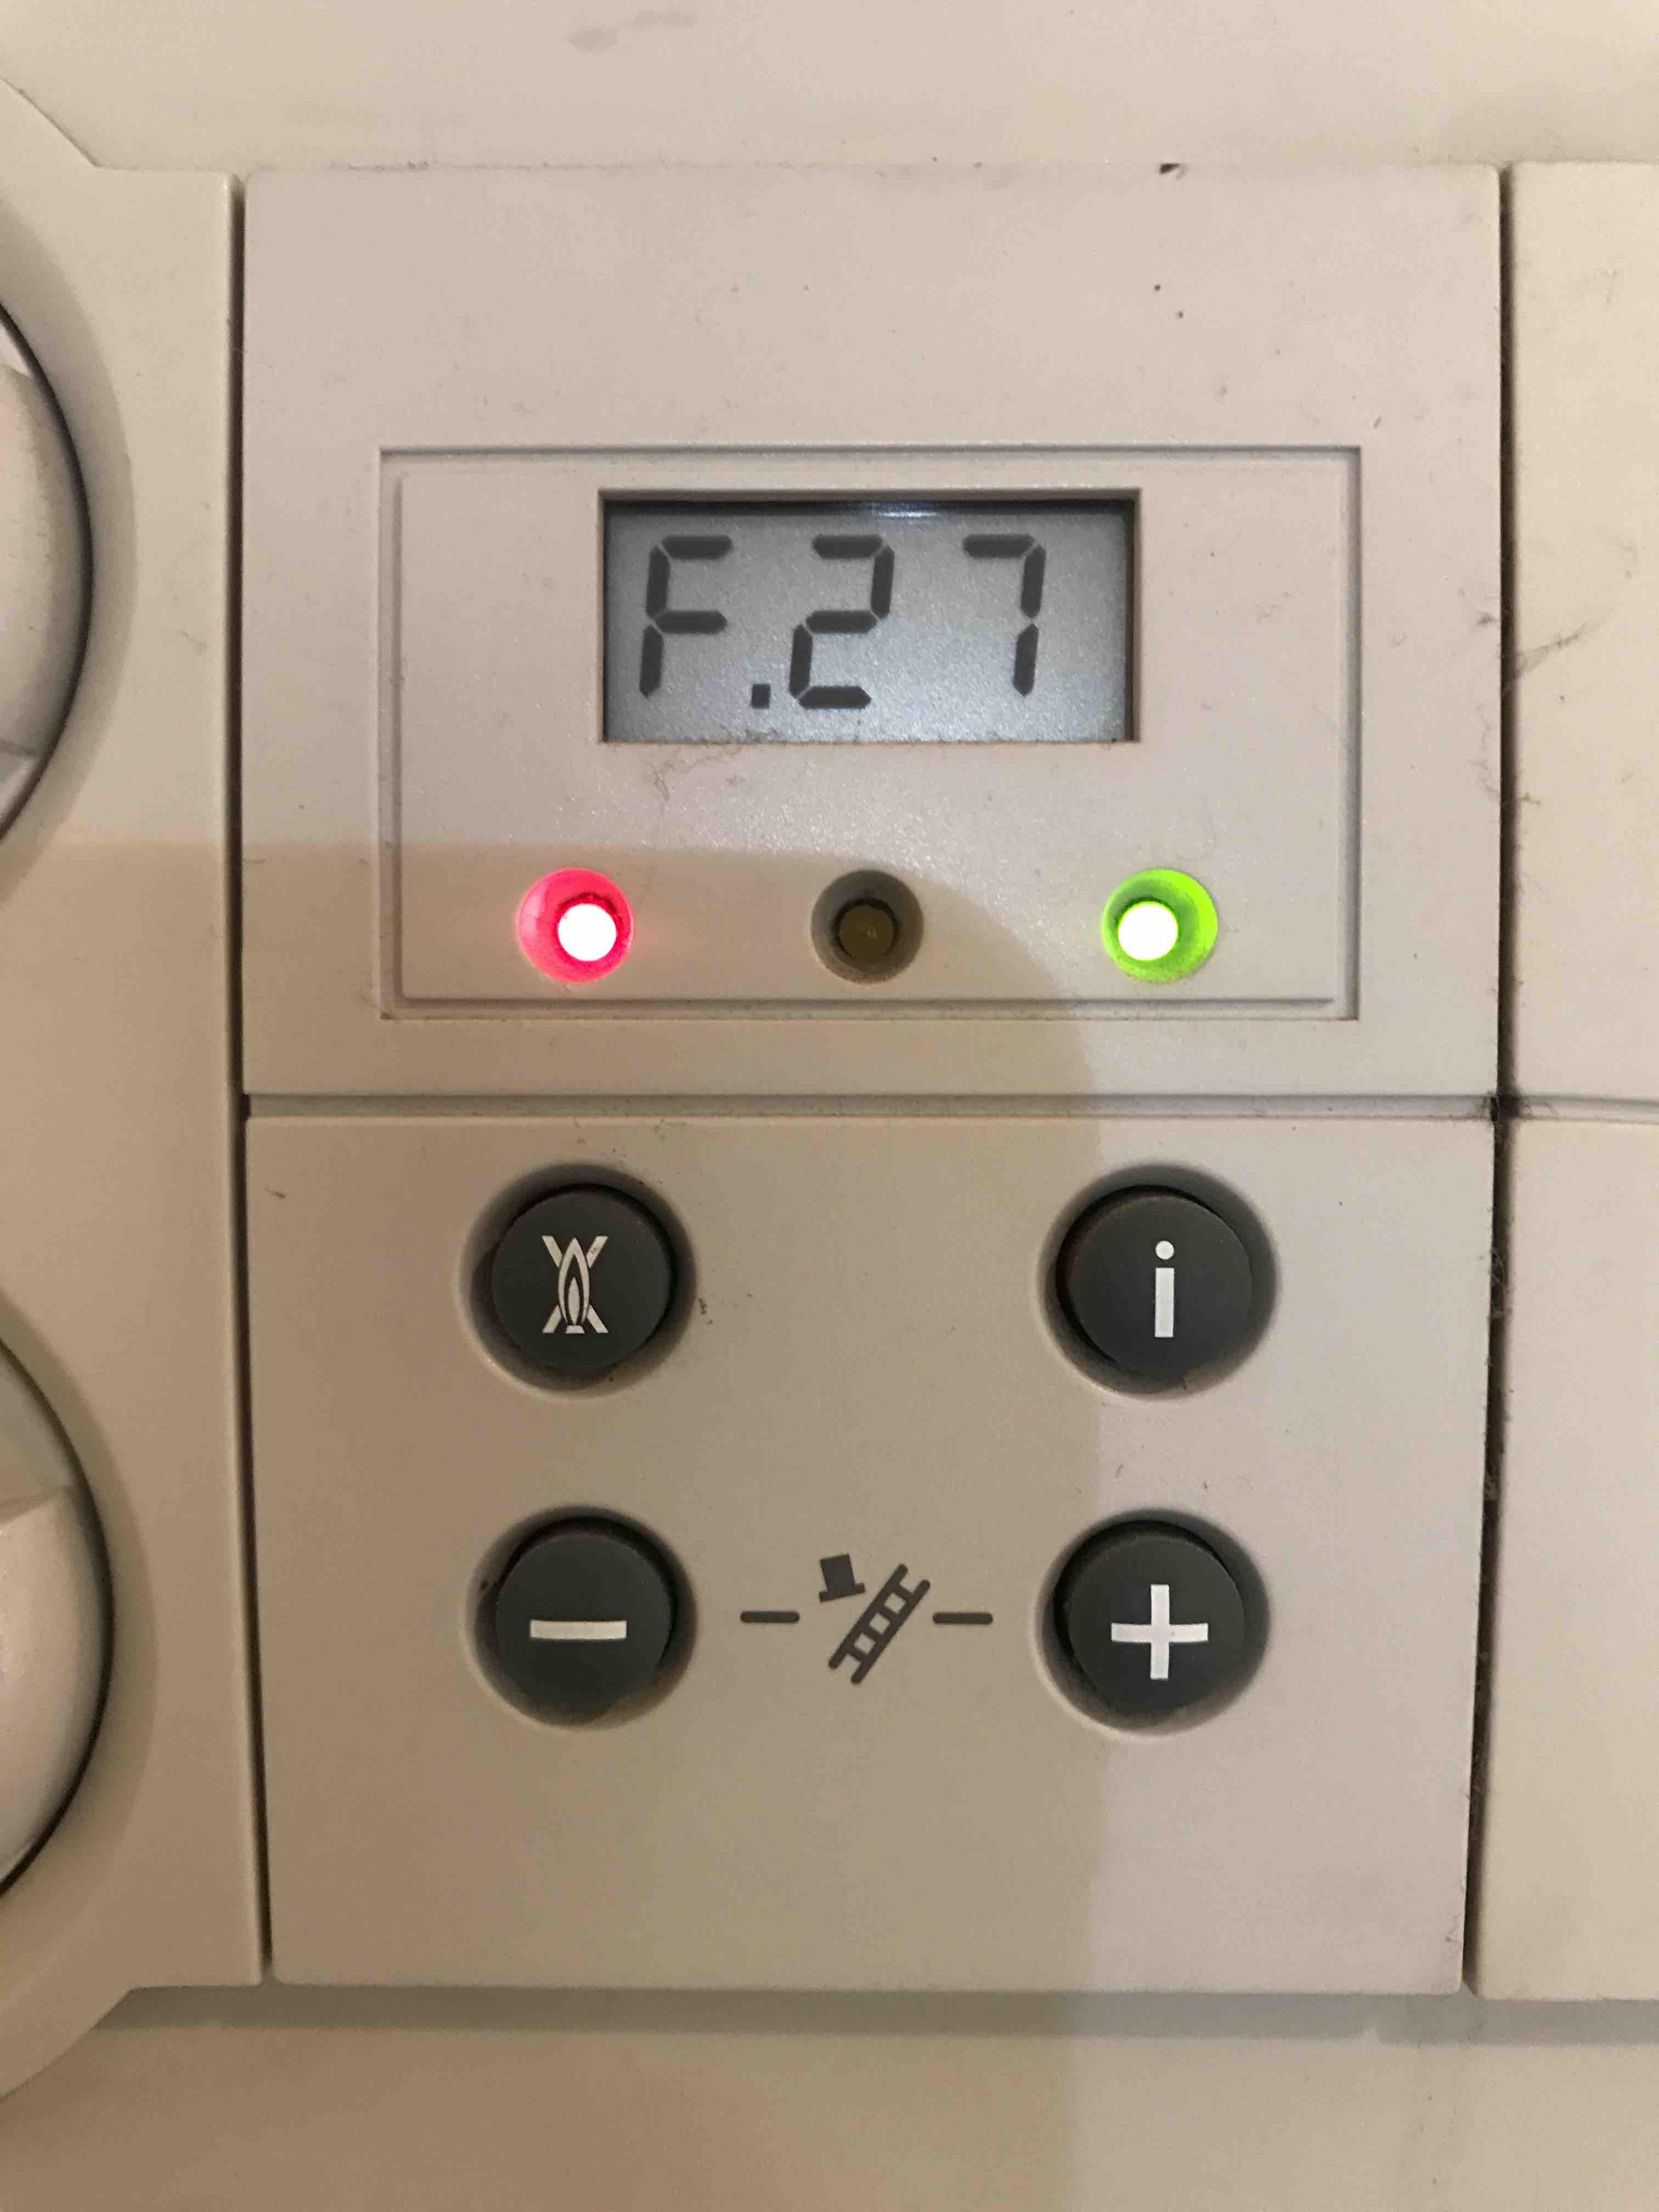 Vaillant ecotec f27 fault expert boiler repair asfbconference2016 Images